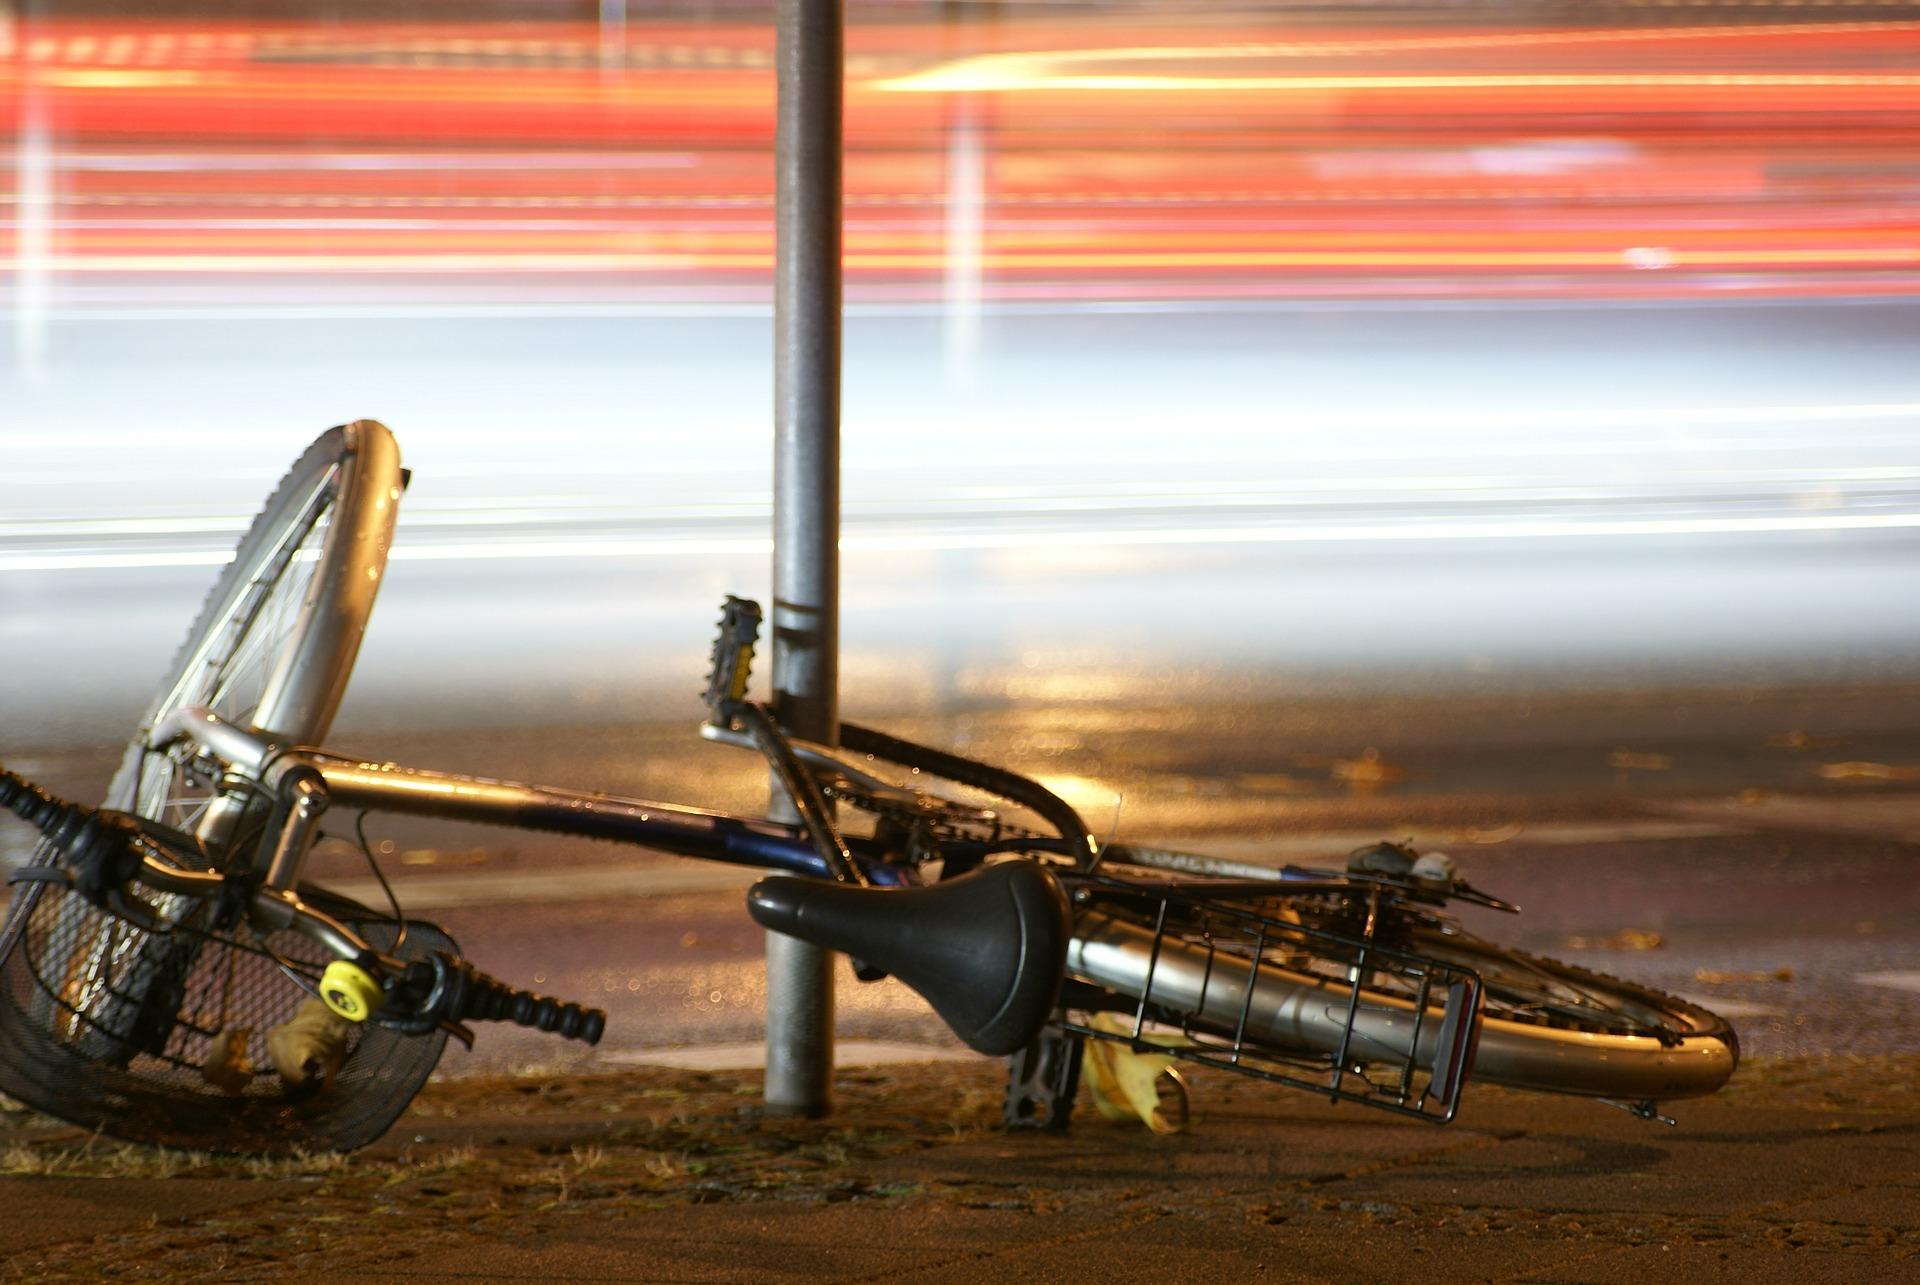 Unfall mit Fahrrad. Symbolfoto.